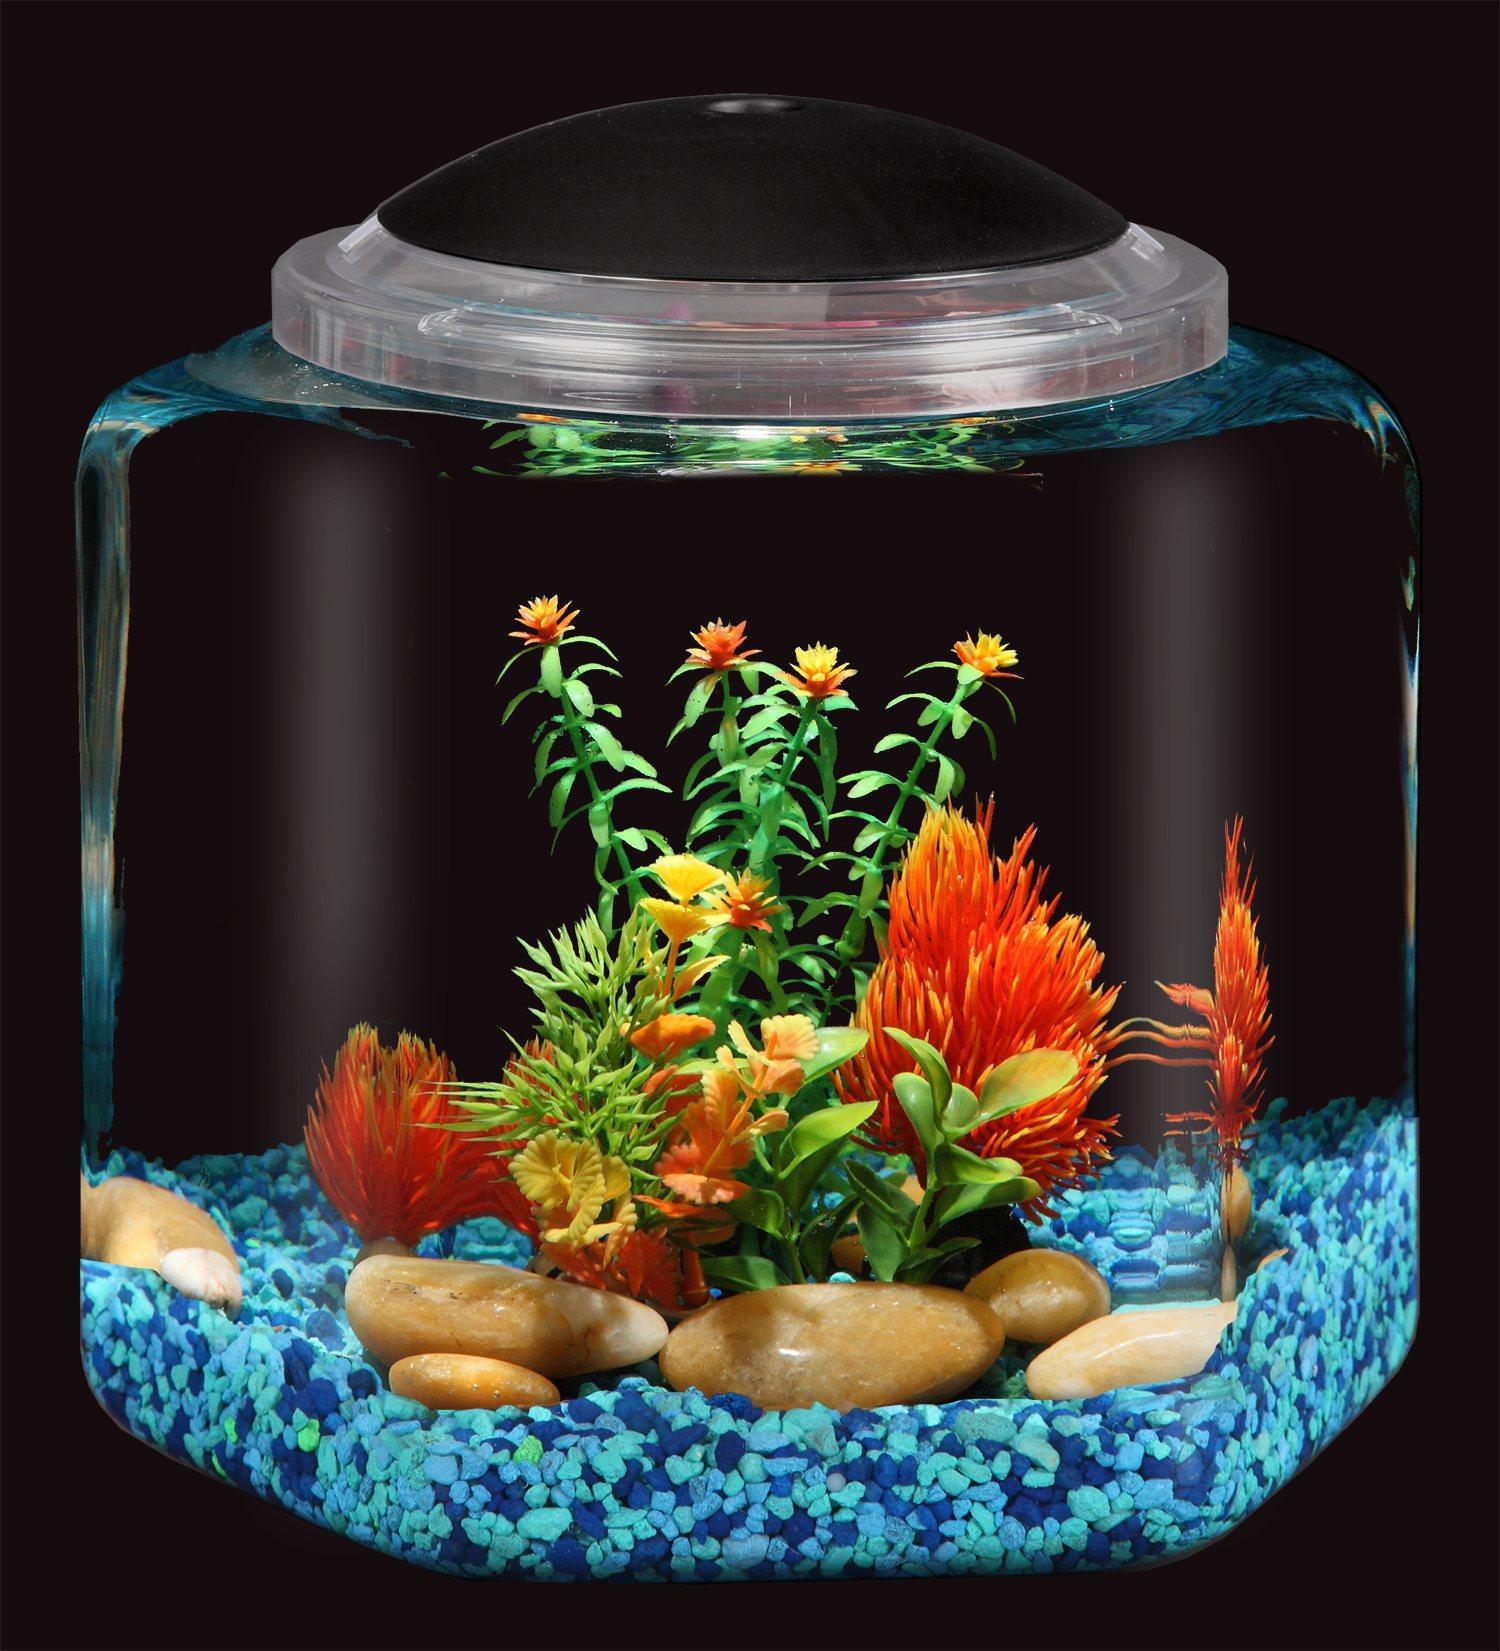 Fish aquarium in bangladesh - From The Manufacturer